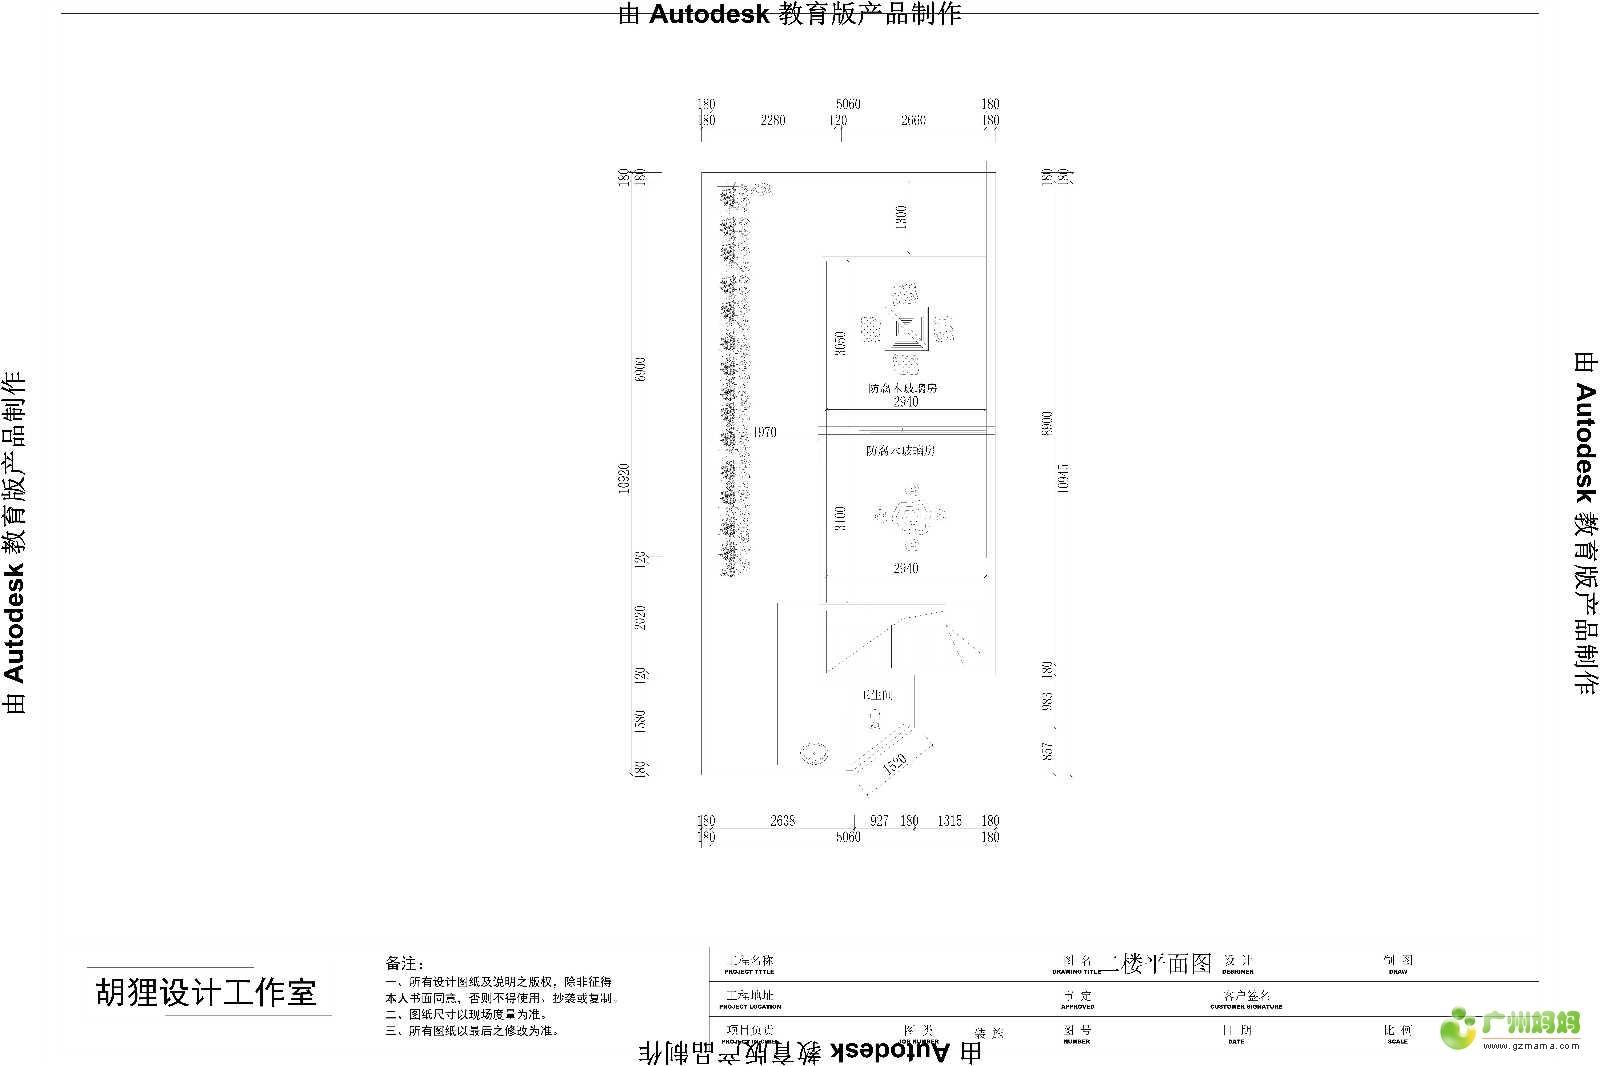 NO.77【至上家居杯日记大赛】客厅家具驾到(首页有购物清单)